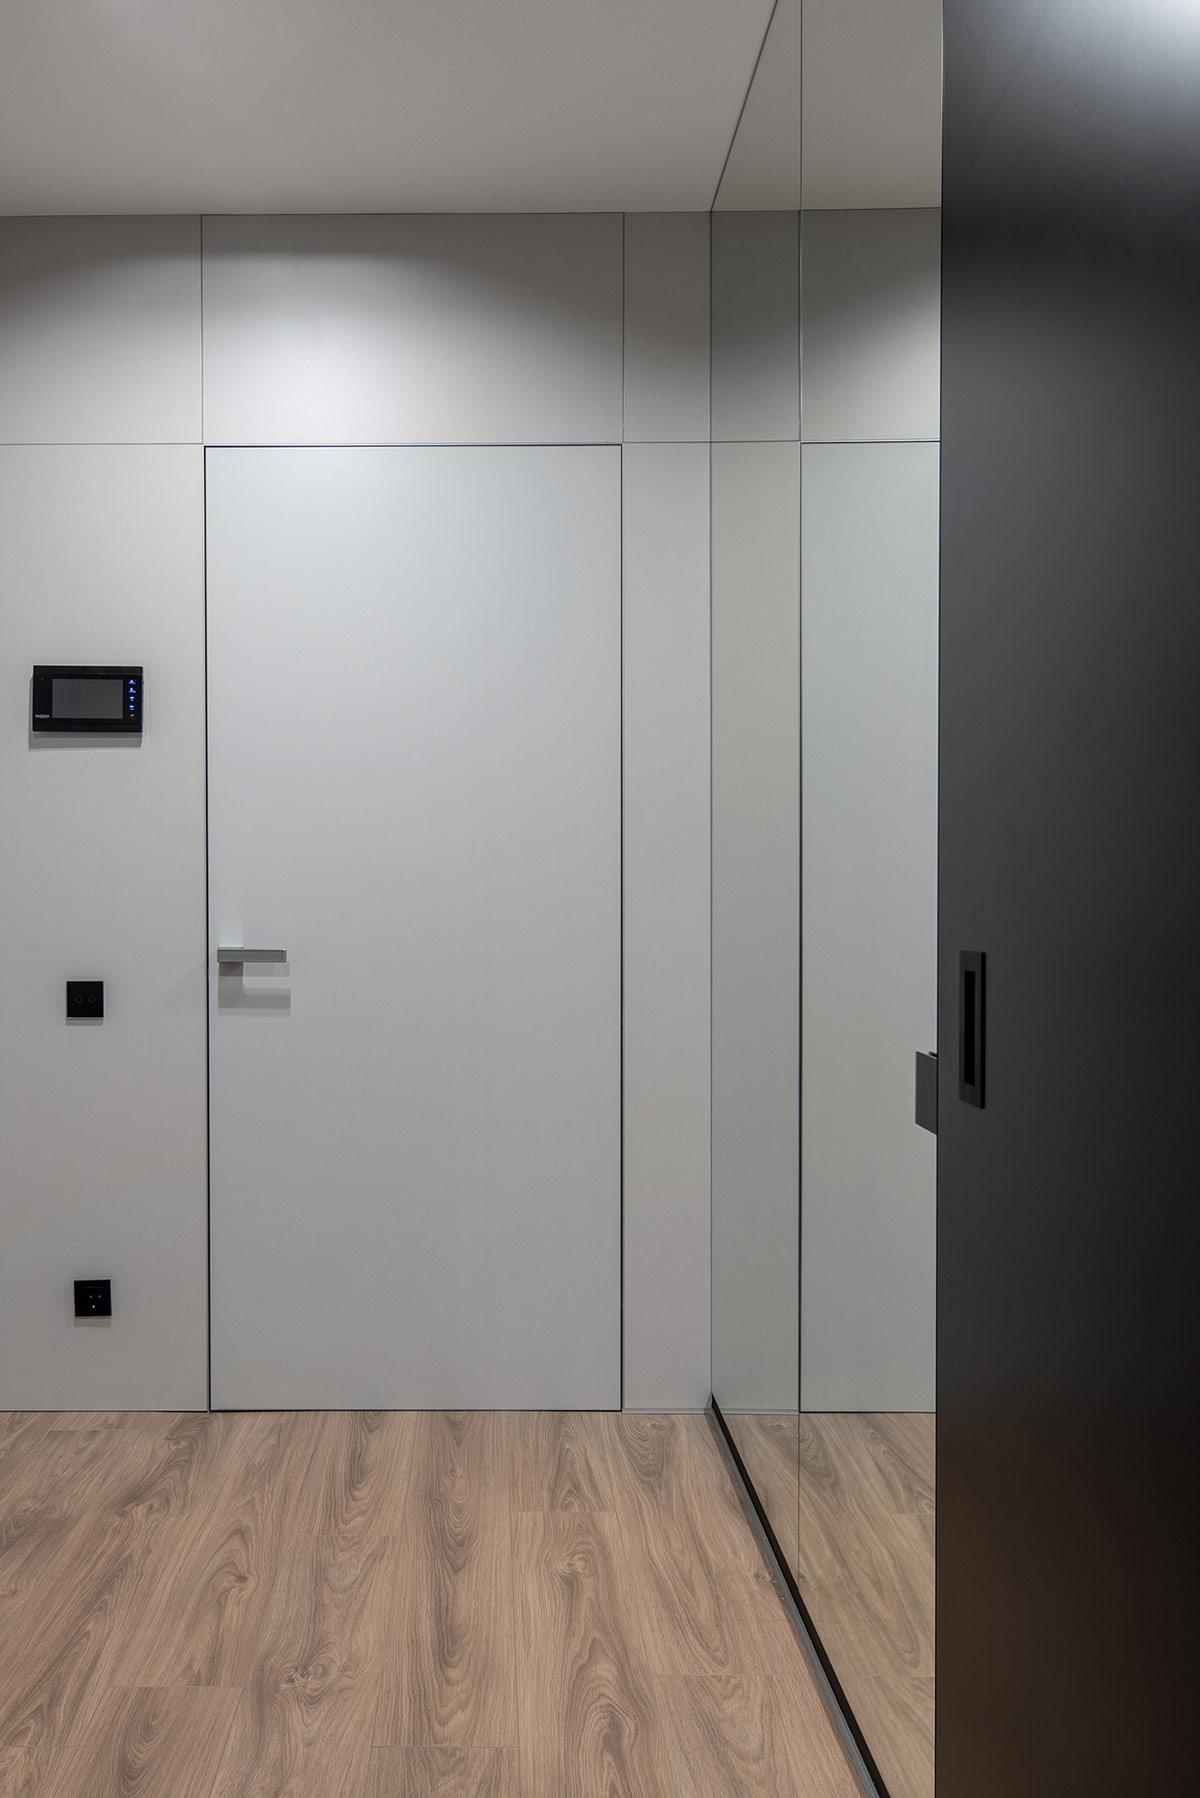 Home Designing 2 Apartments Under 120 Square Meters 1300